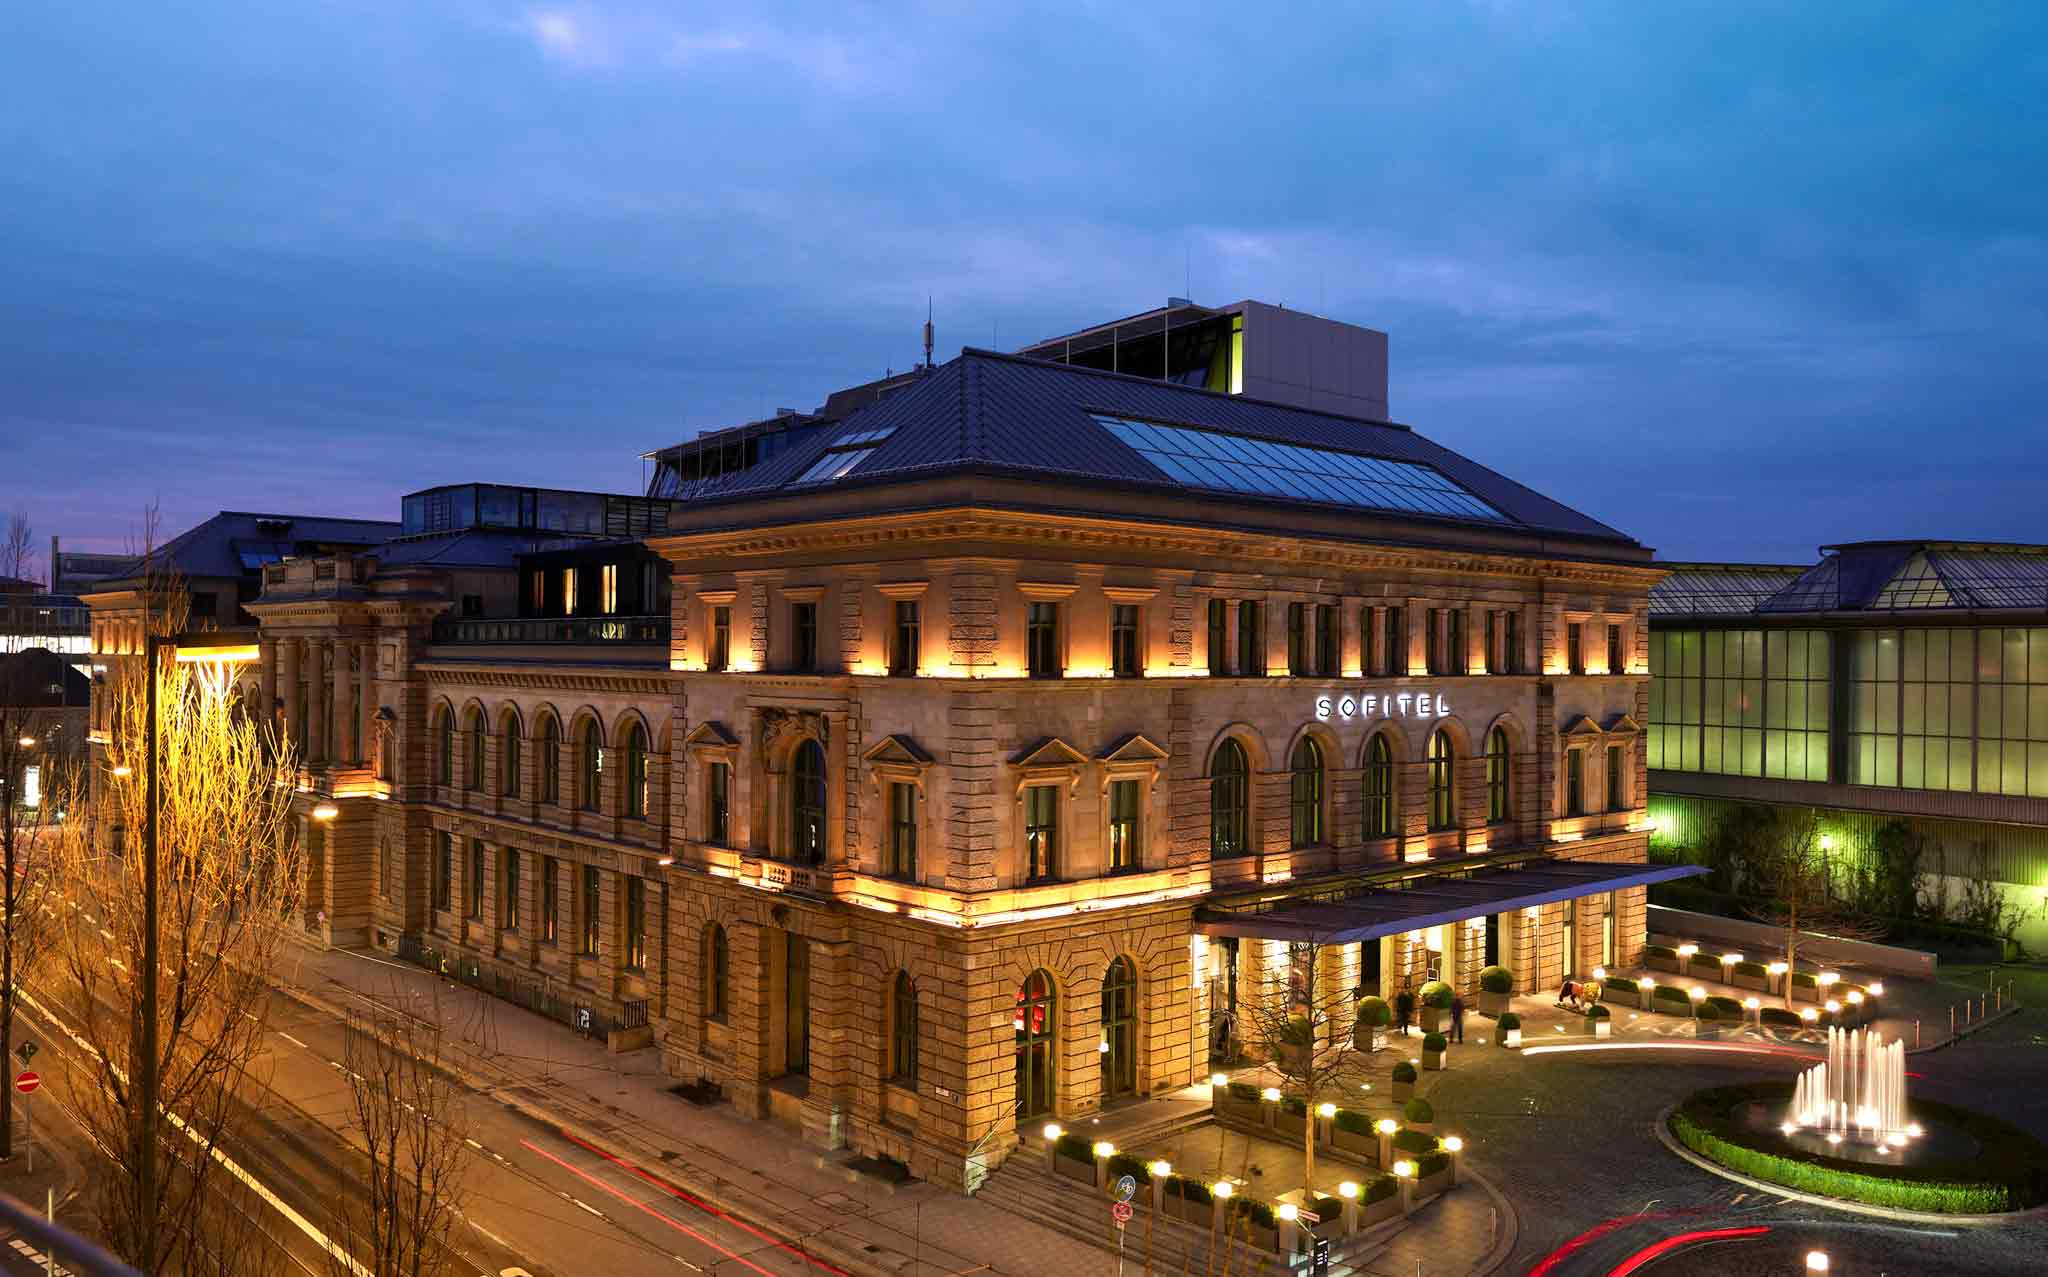 Hotel - Sofitel Munich Bayerpost